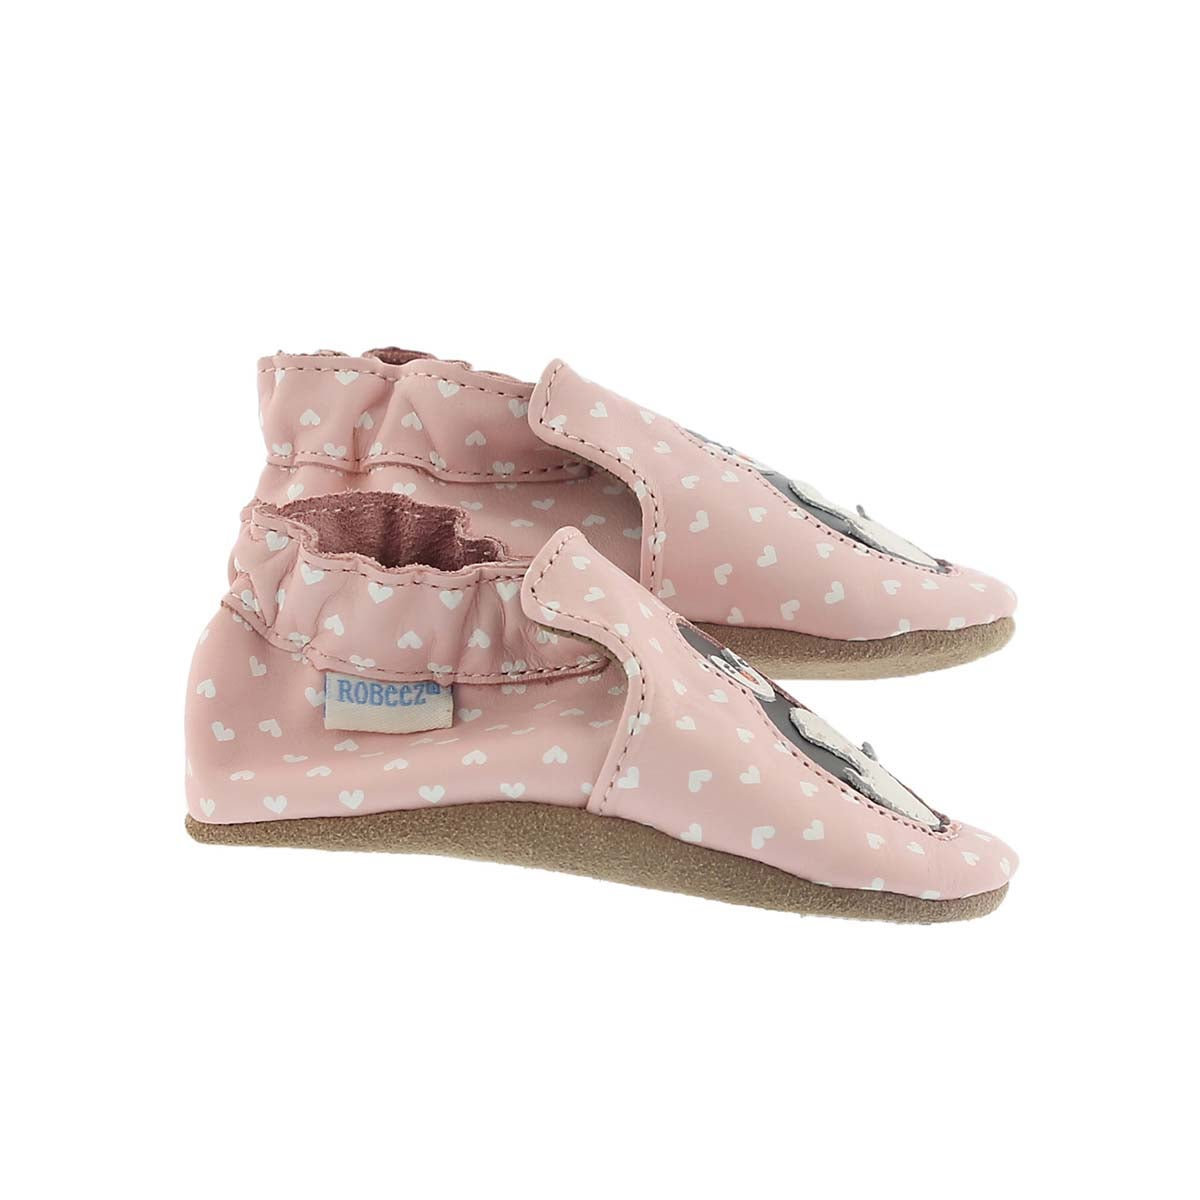 Inf Piper Penguin pastel pink slipper